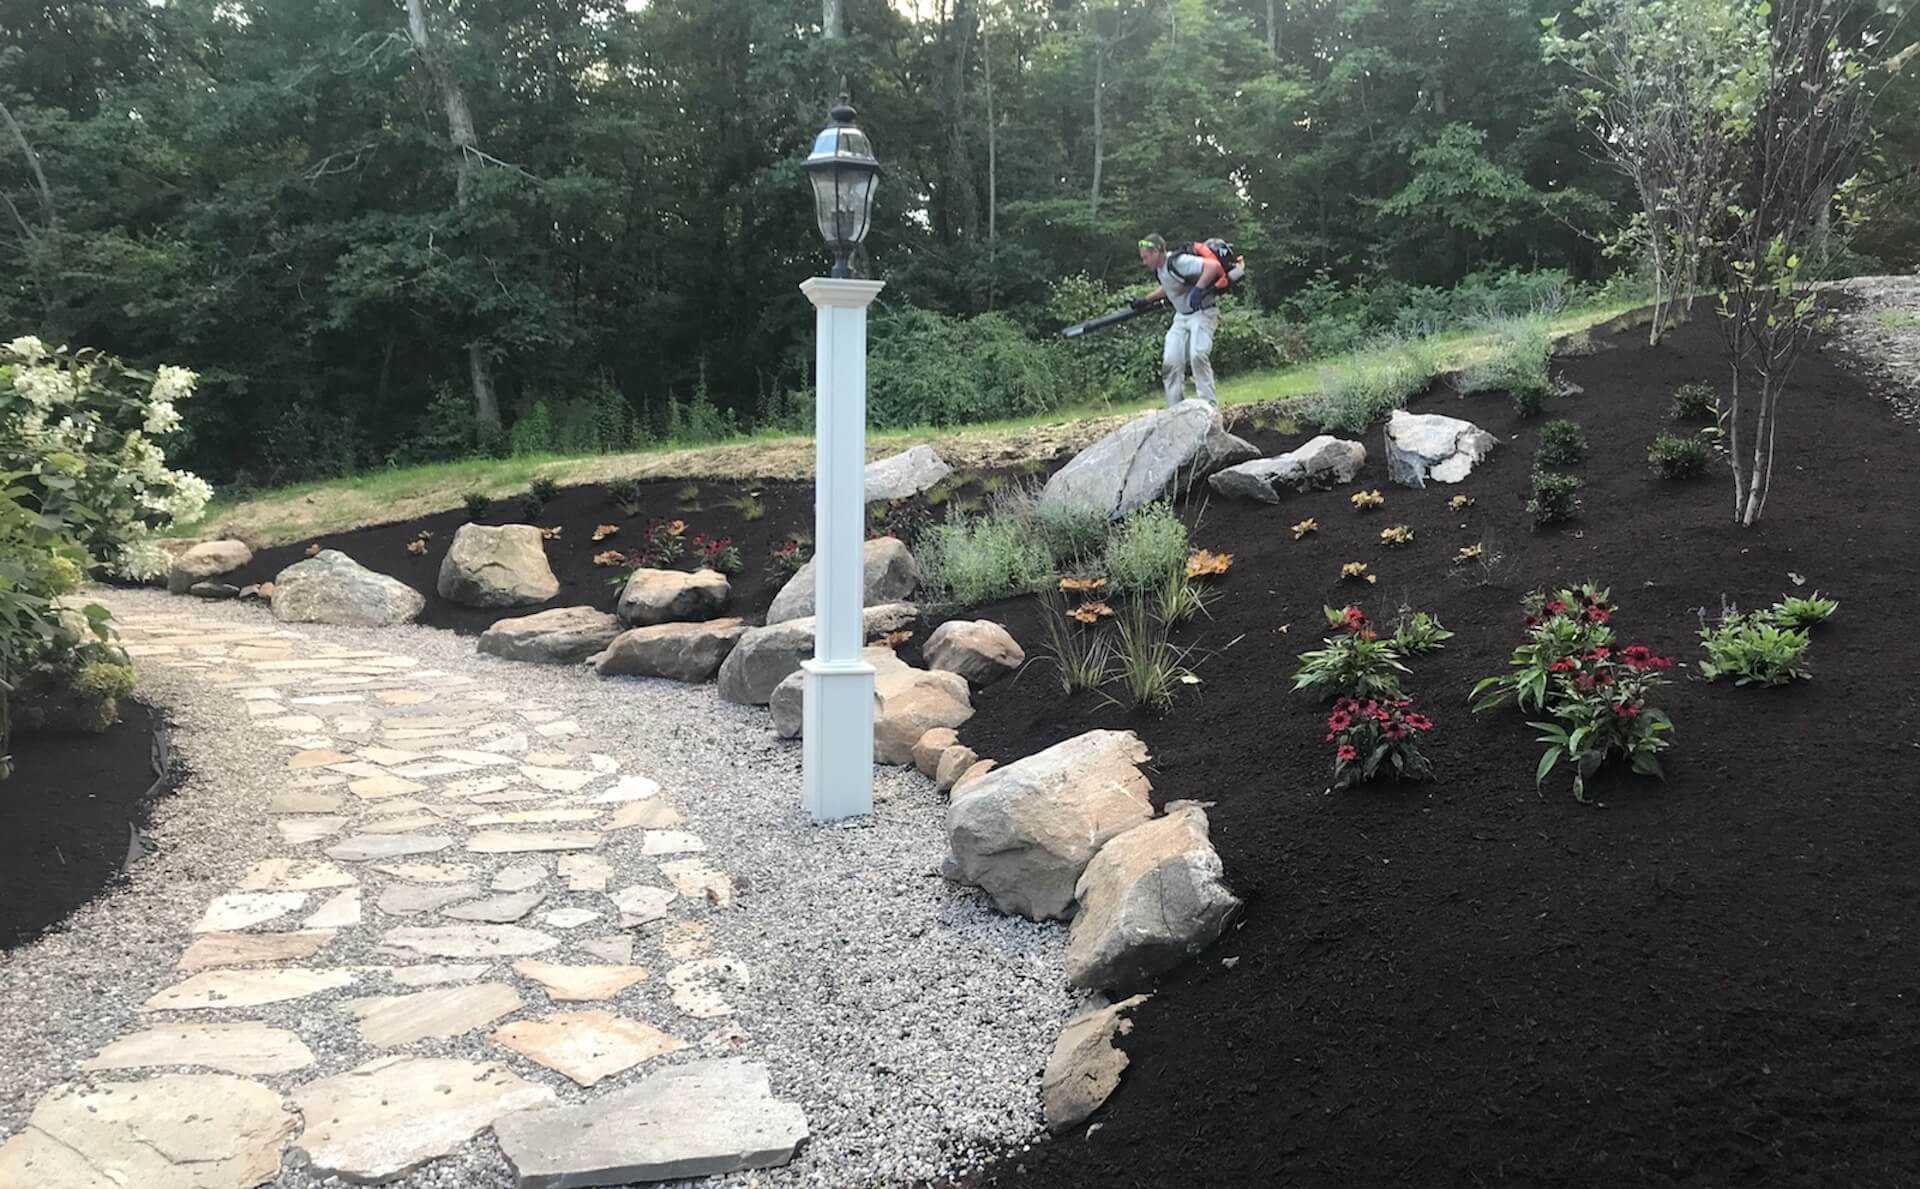 Falls River Retreat Residence catharine ann farnen landscape architecting